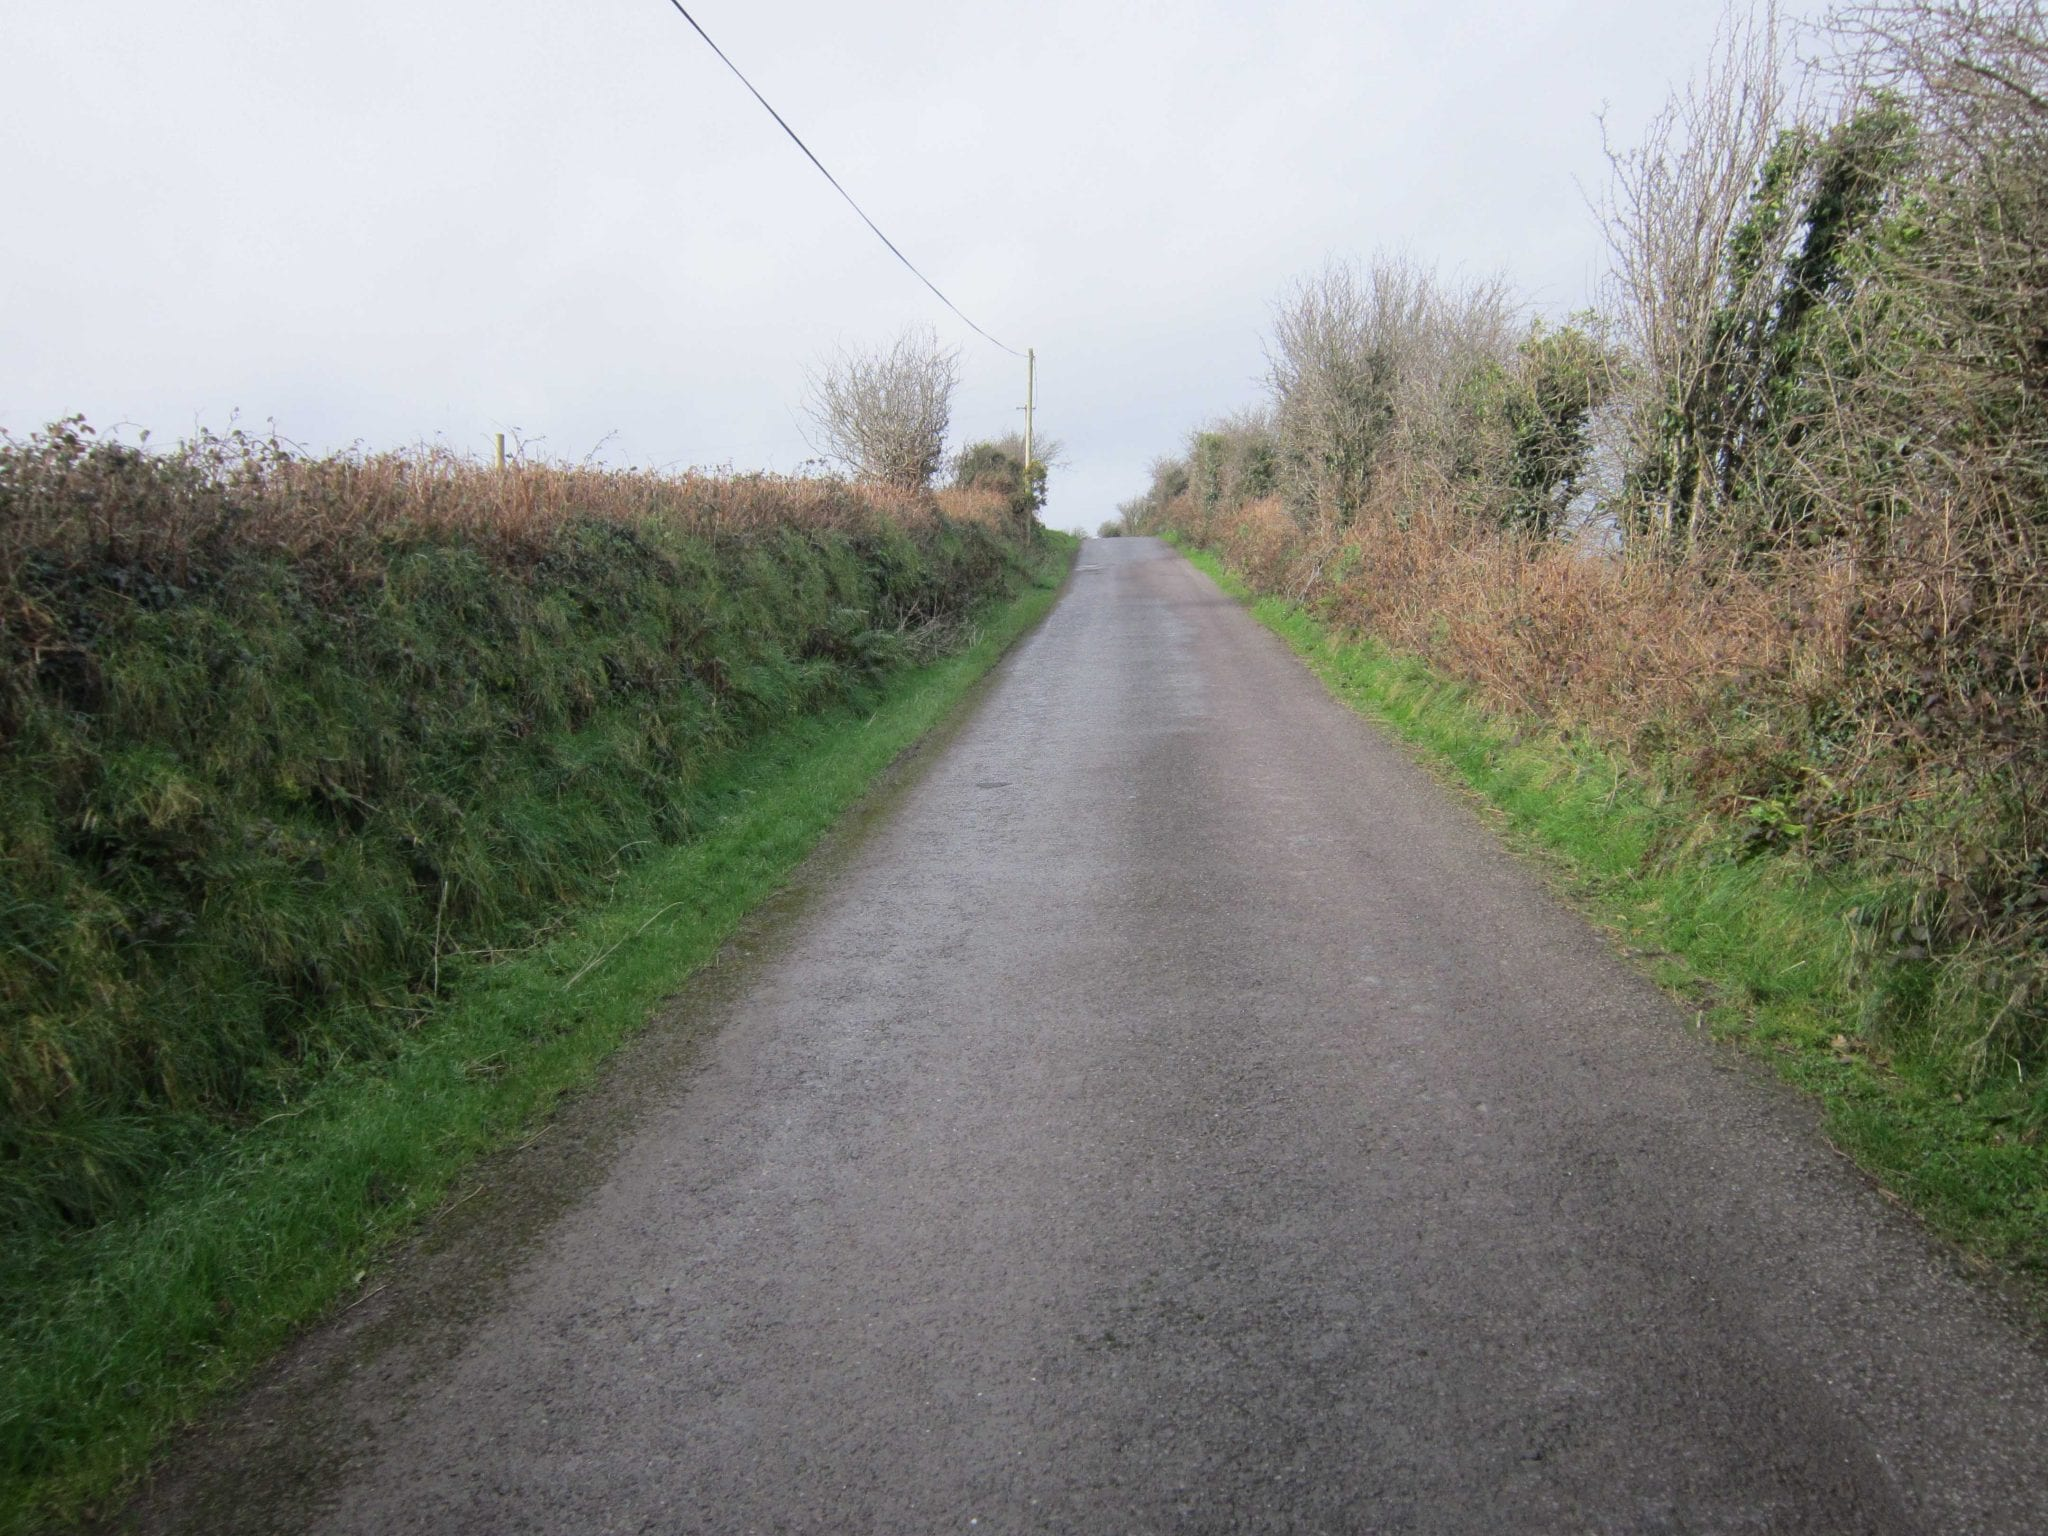 2. Road IMG_4702